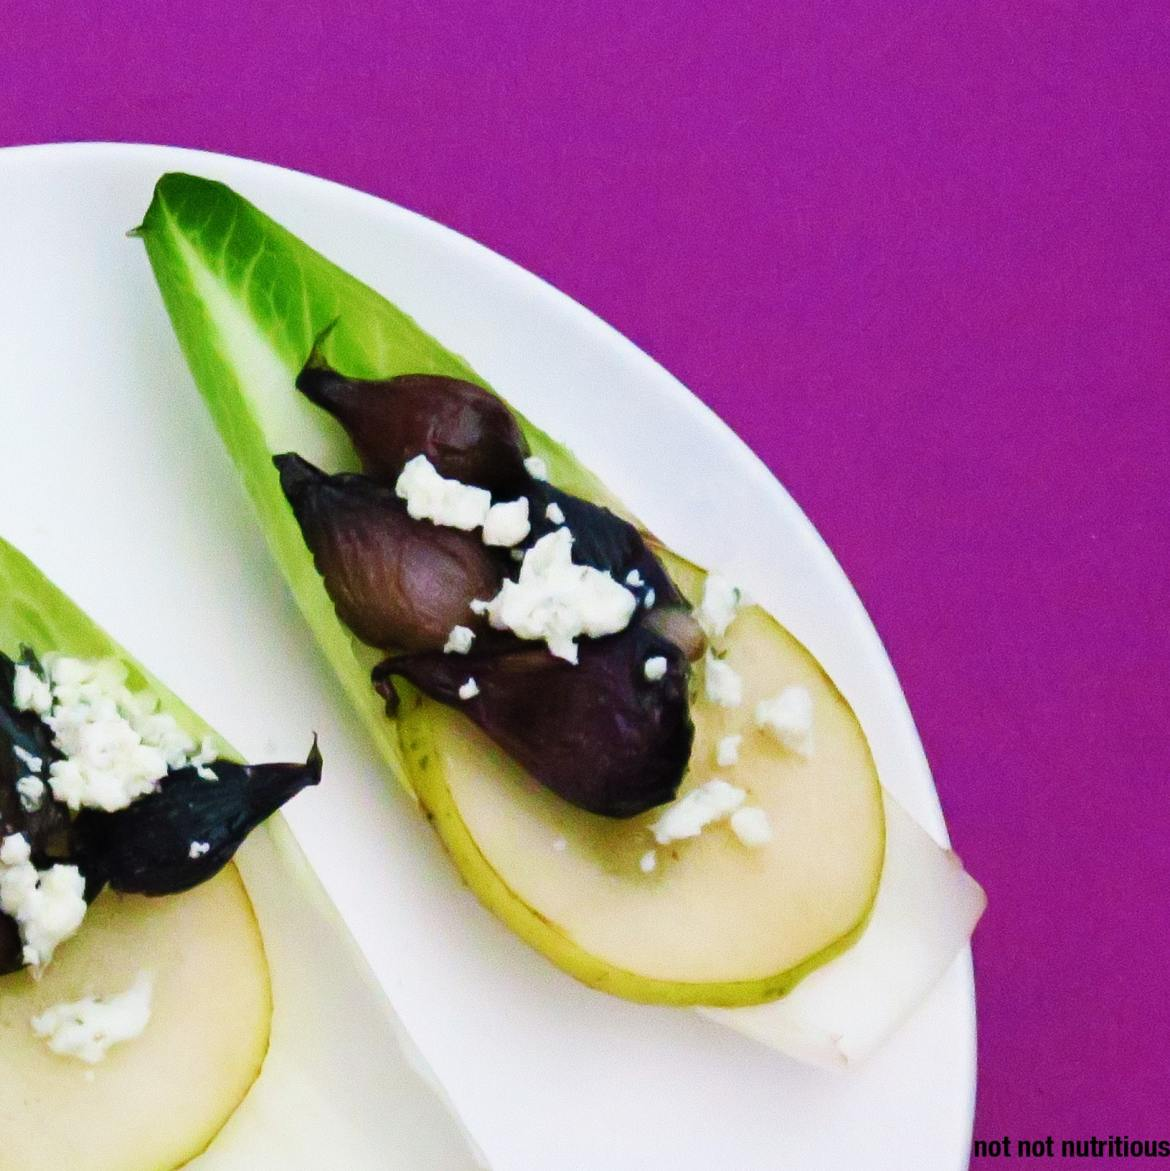 vegetarian_sweet_onion_pear_endive_goat_cheese_MG_1771